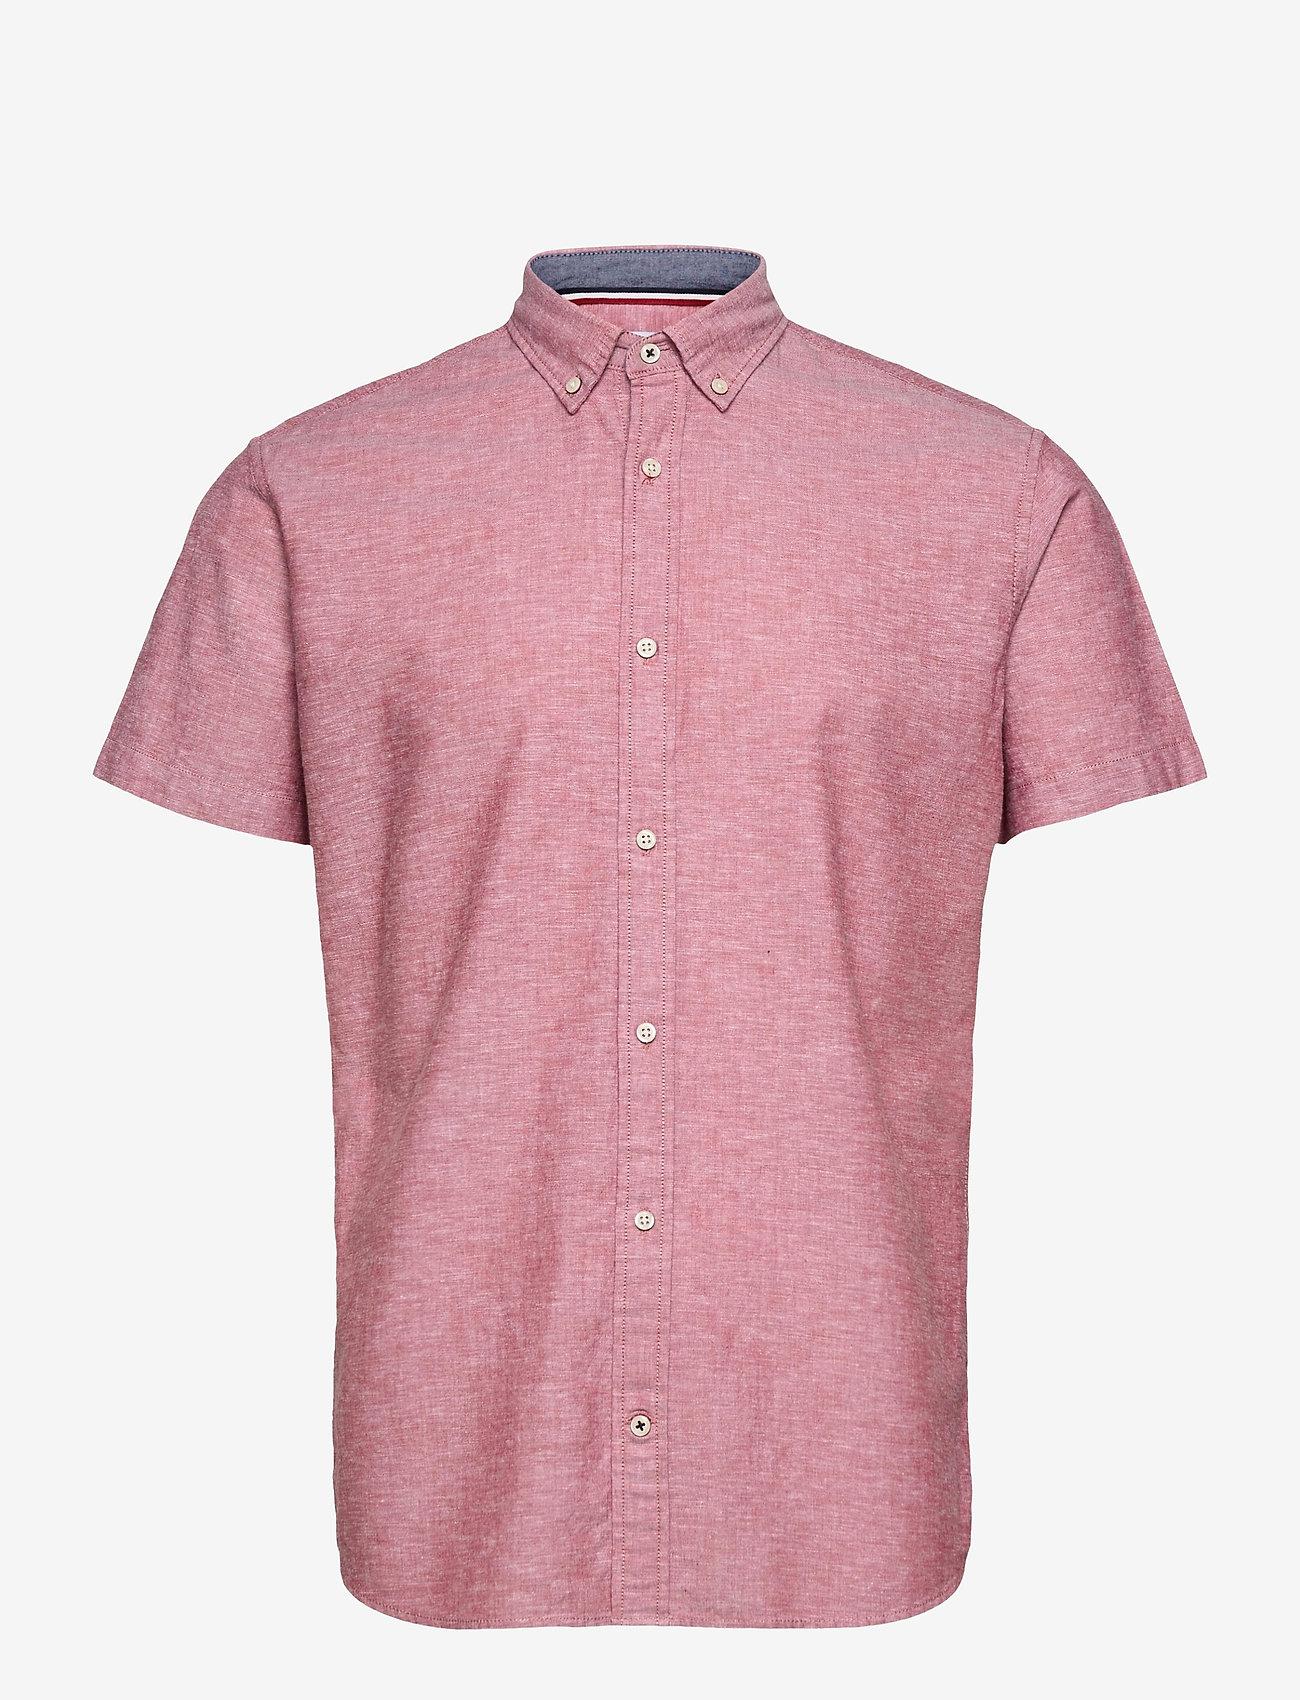 Jack & Jones - JJESUMMER SHIRT S/S S21 STS - basic skjortor - rio red - 0